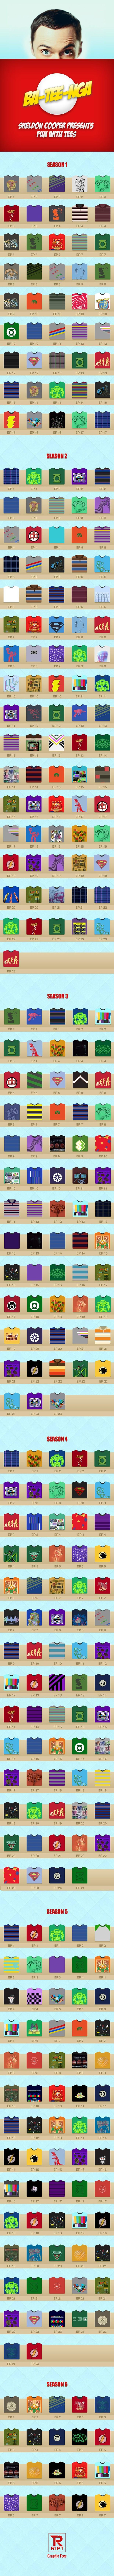 Vamers - FYI - TV - Ba-Tee-nga - Every Single T-shirt Worn by Sheldon Cooper Ever